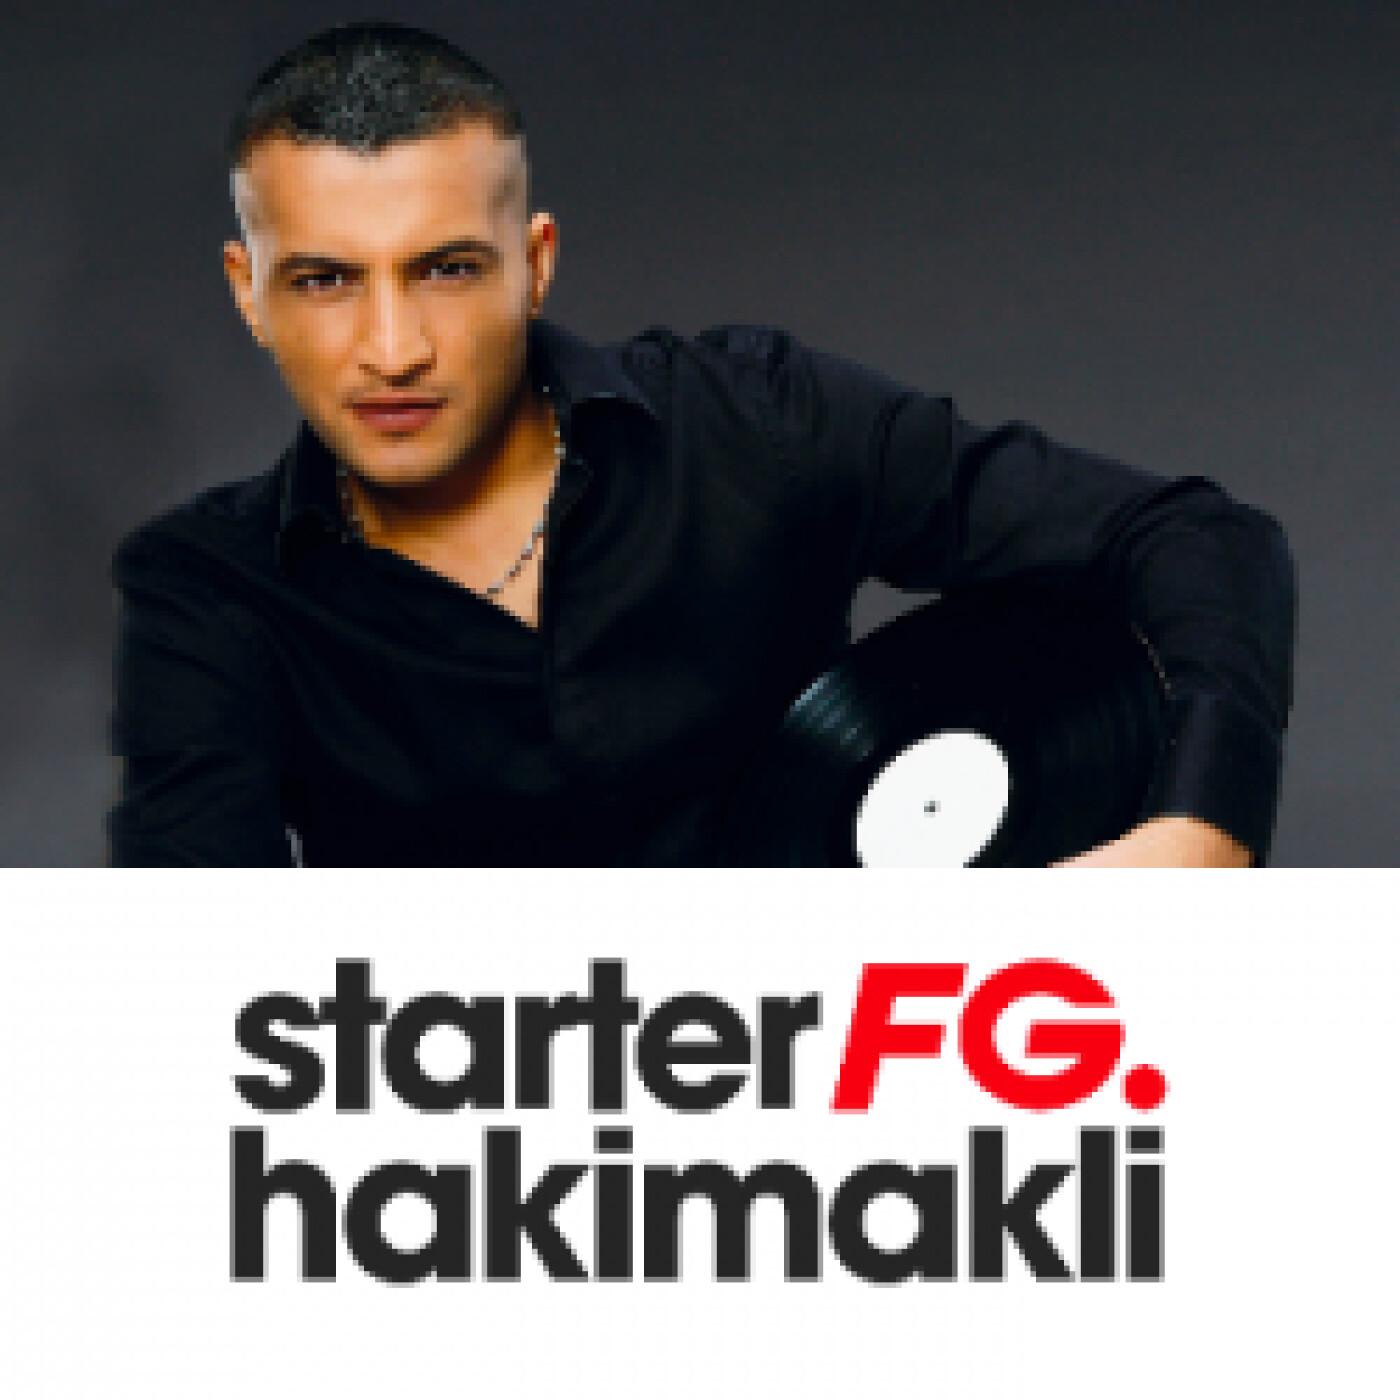 STARTER FG BY HAKIMAKLI MERCREDI 7 AVRIL 2021